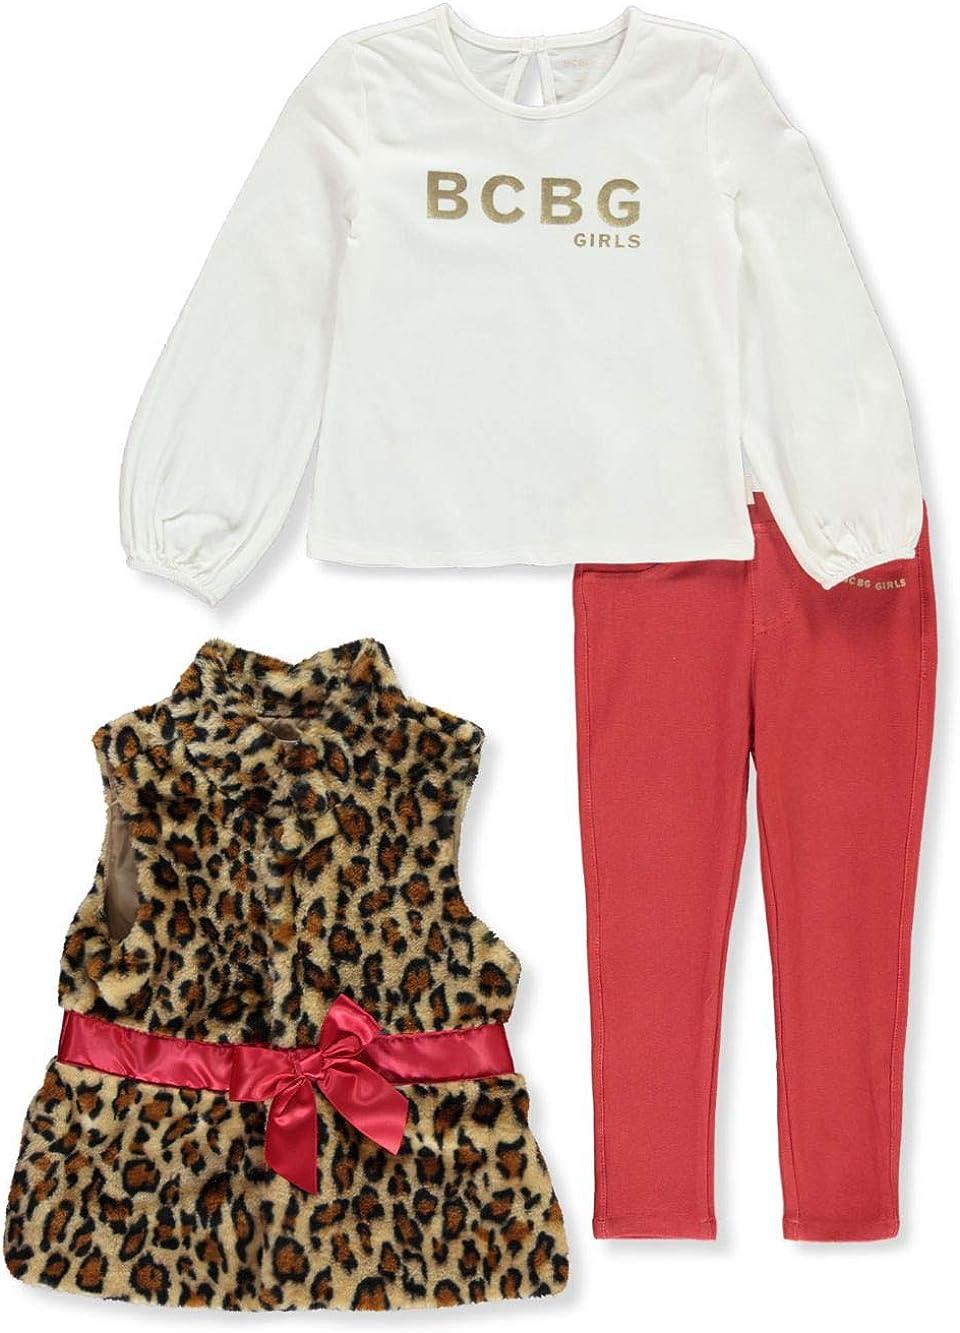 BCBG Girls Satin-Banded Leopard 3-Piece Pants Set Outfit